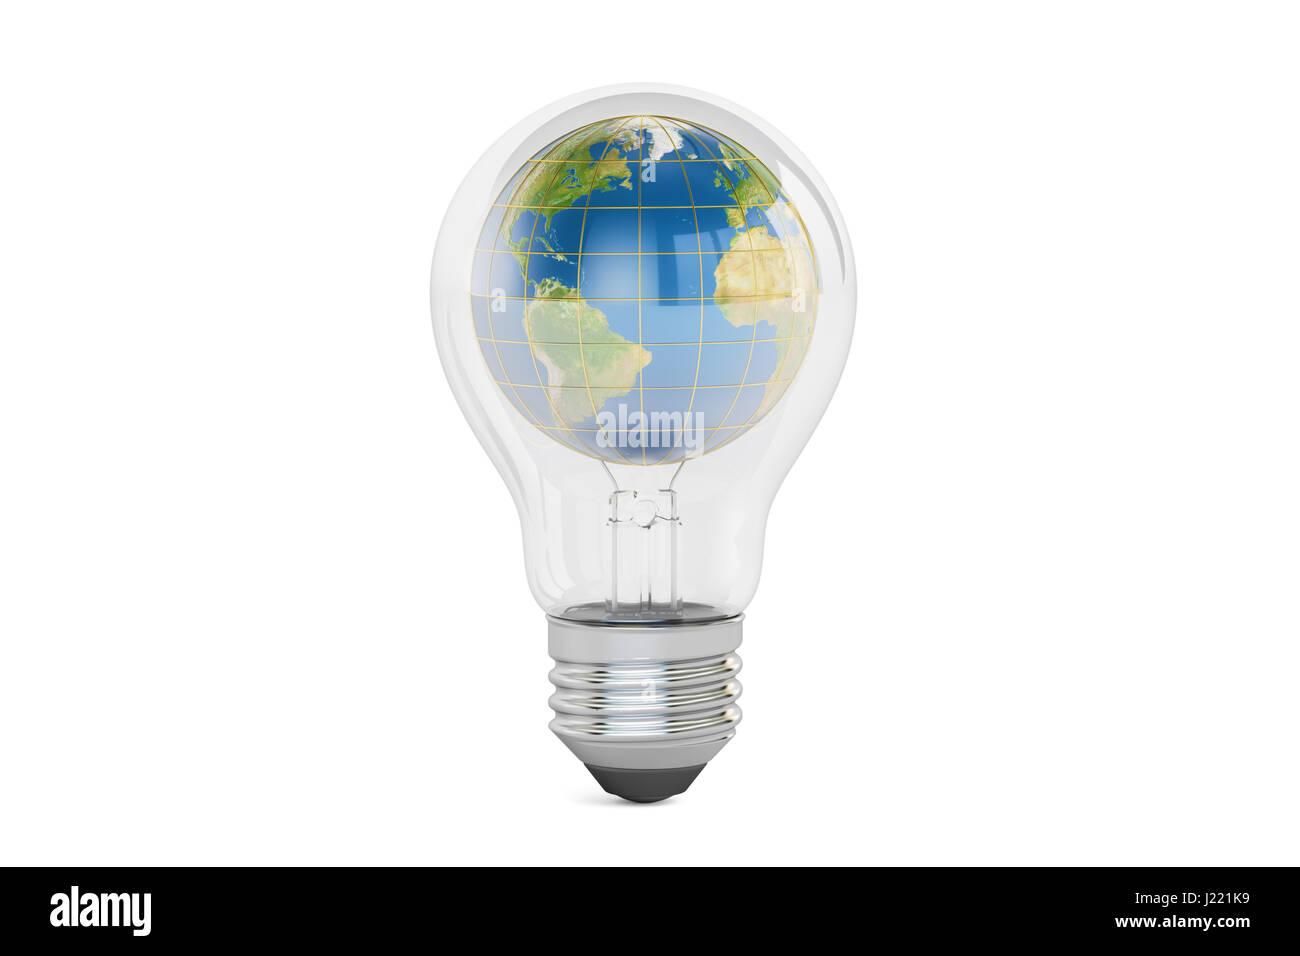 light bulb with earth globe inside save energy concept 3d